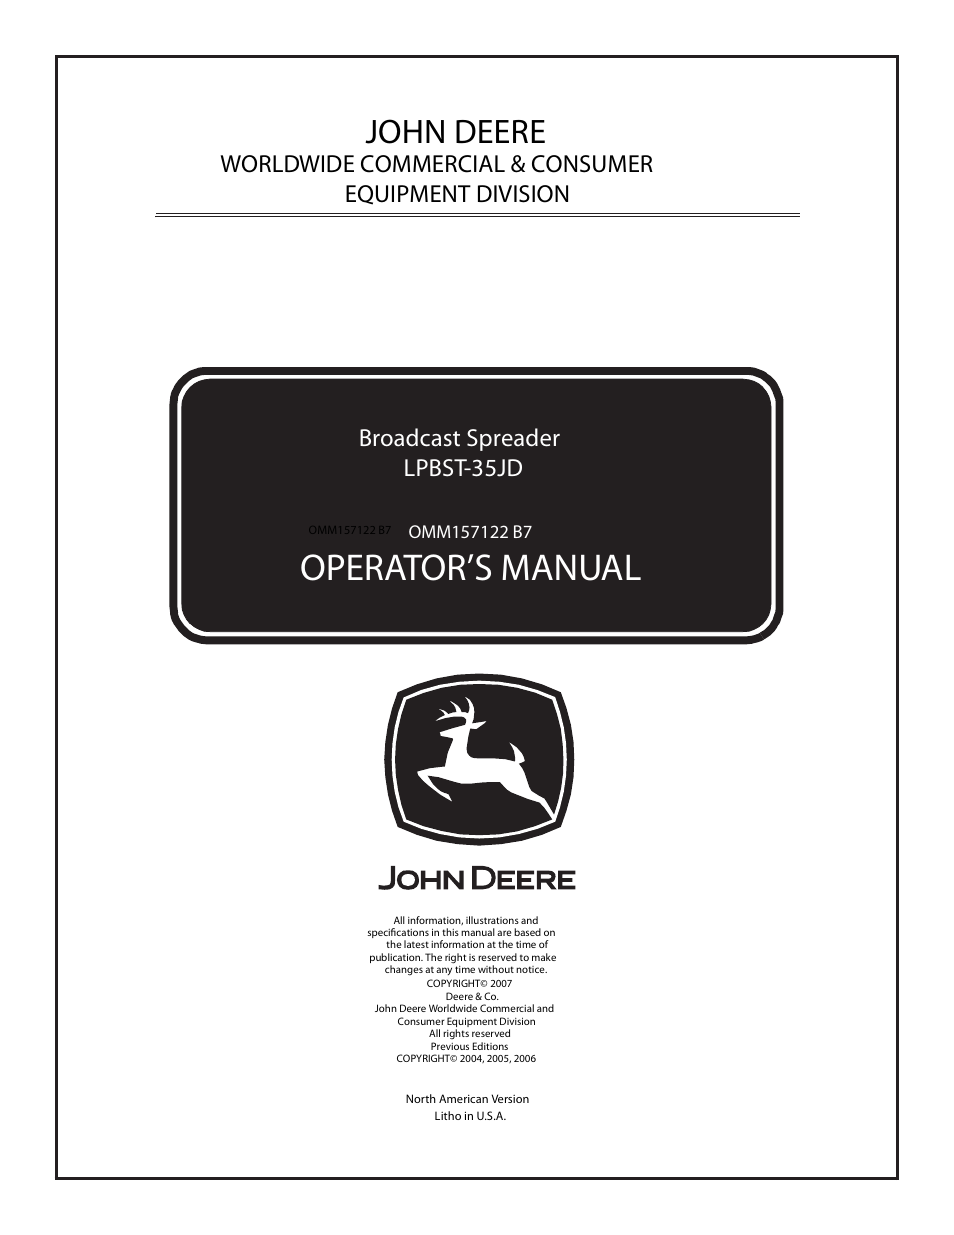 john deere lpbst 35jd user manual 12 pages rh manualsdir com john deere l110 owners manual pdf john deere l110 operator manual download